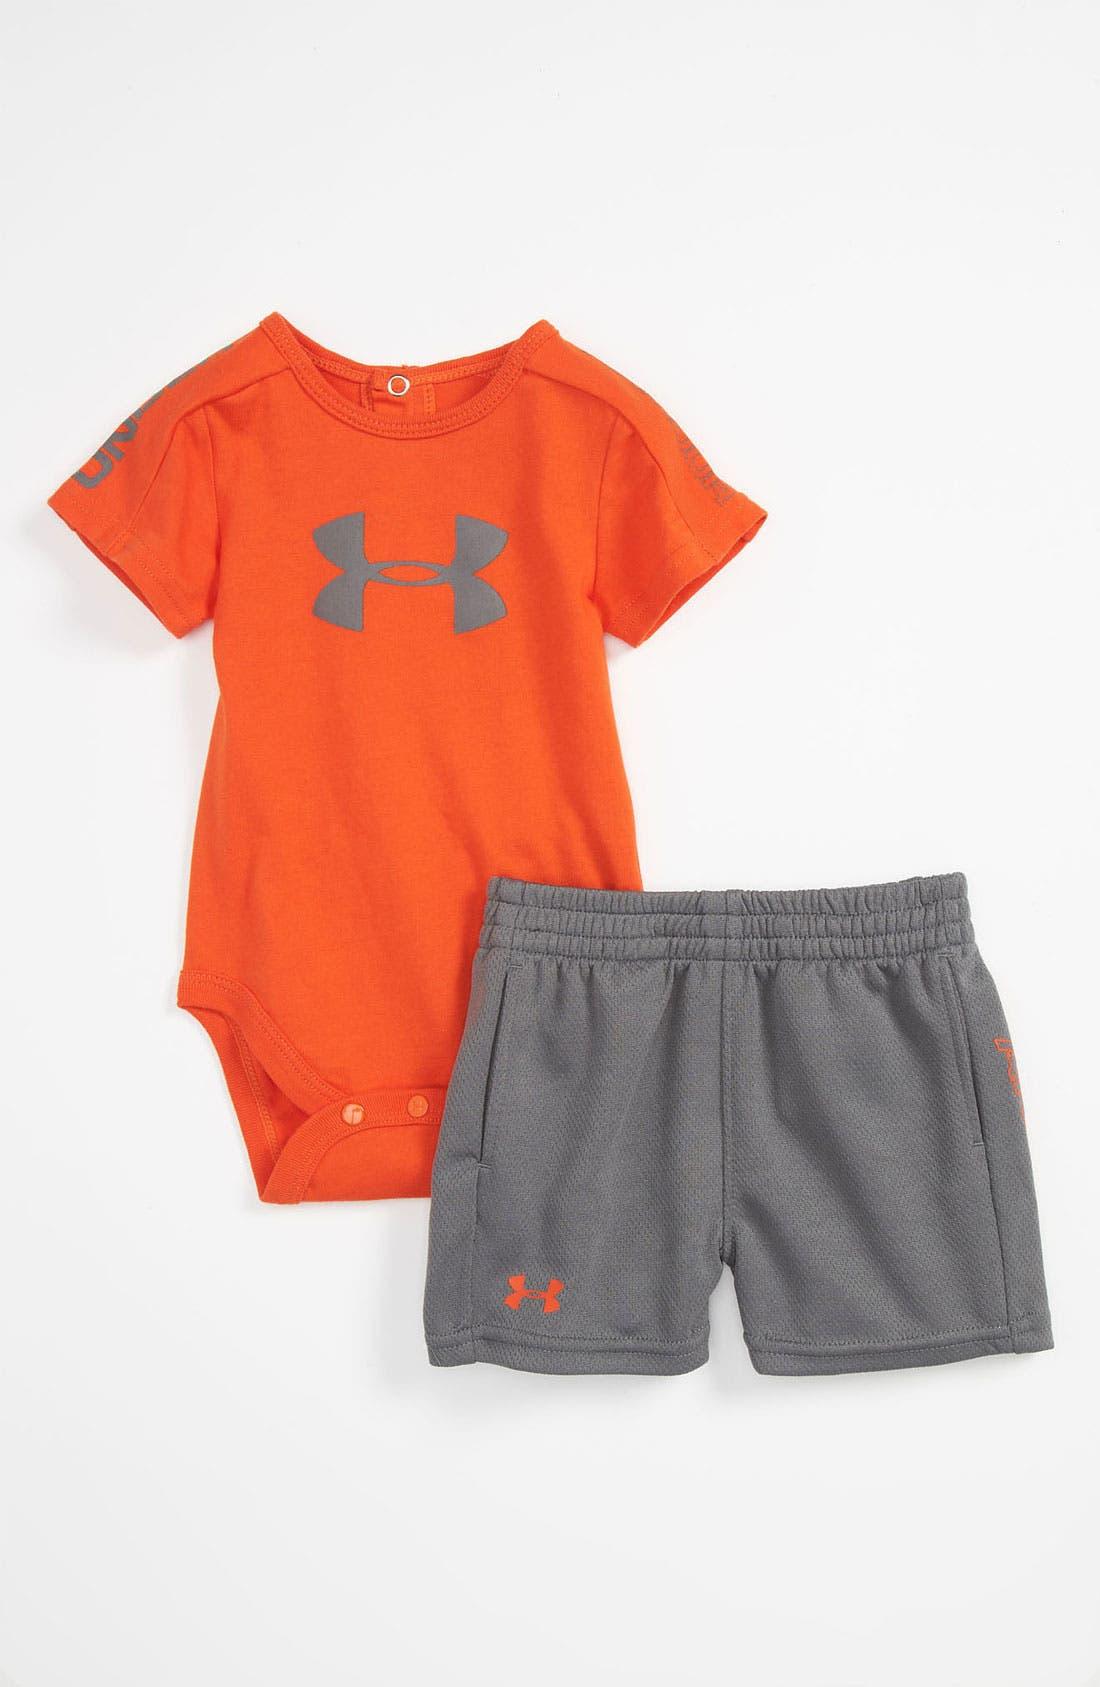 Main Image - Under Armour 'Integrity 2.0' Bodysuit & Shorts (Infant)